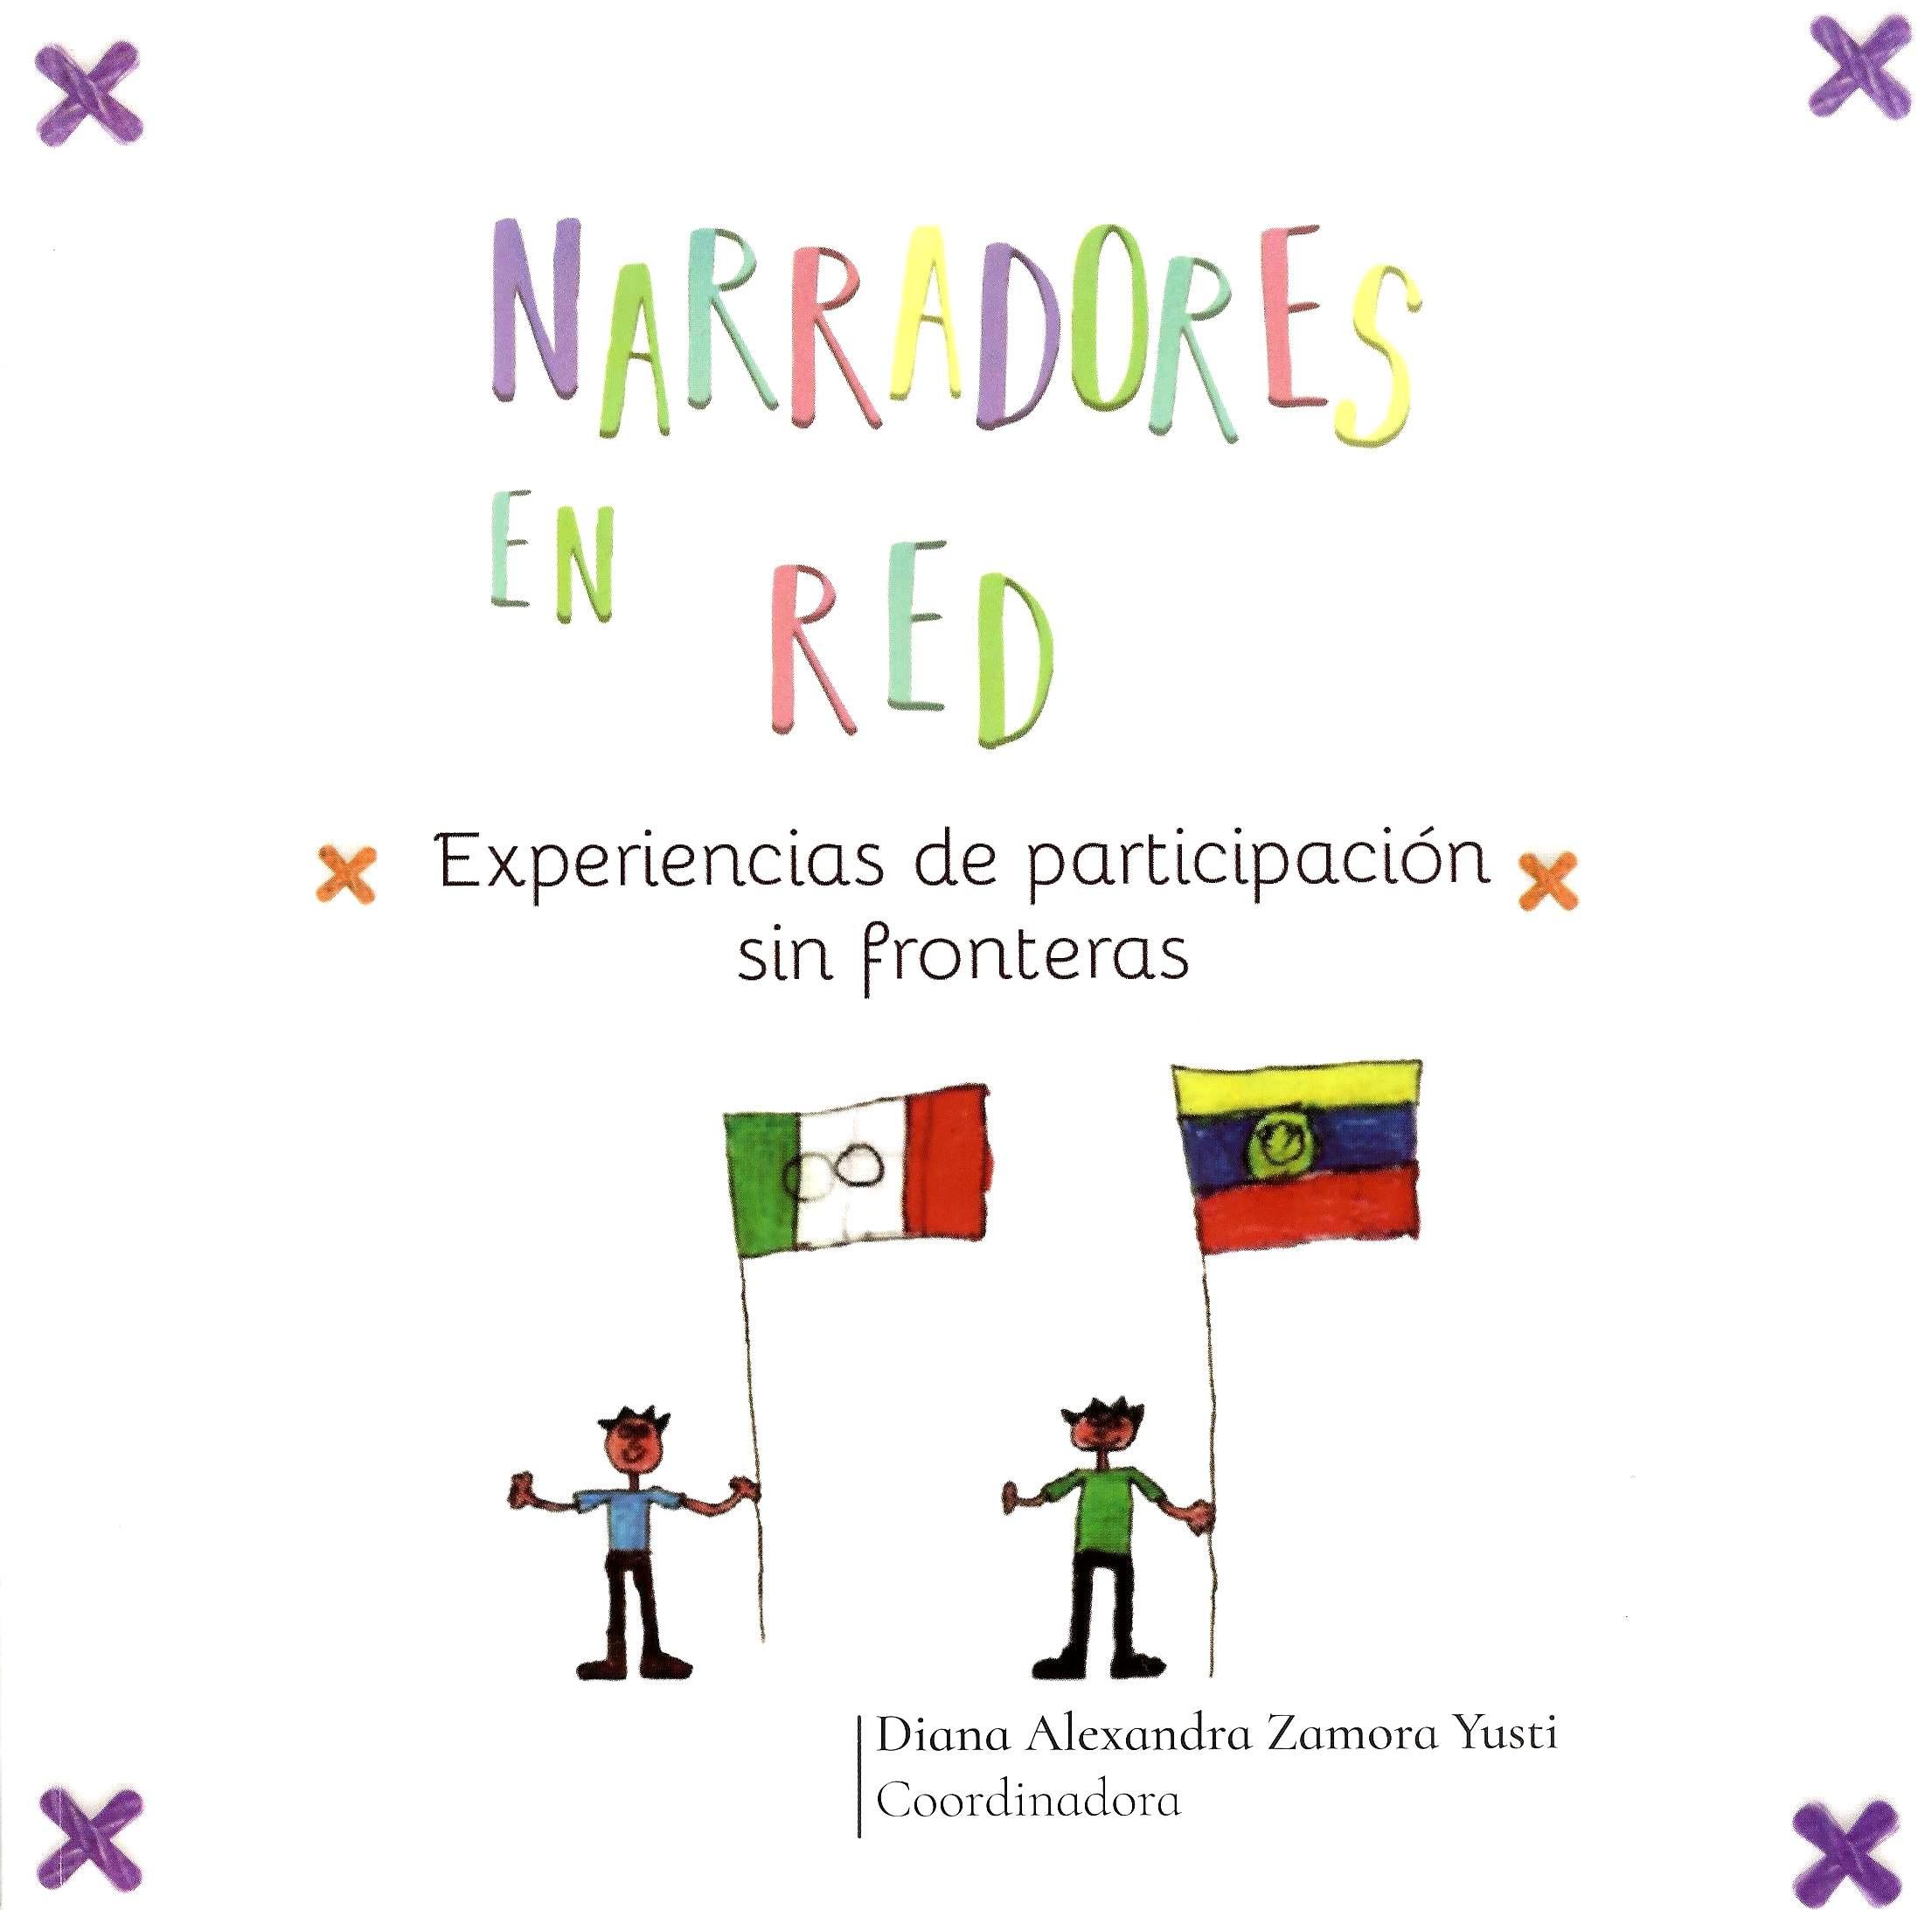 Narradores en red: experiencias de participación sin fronteras